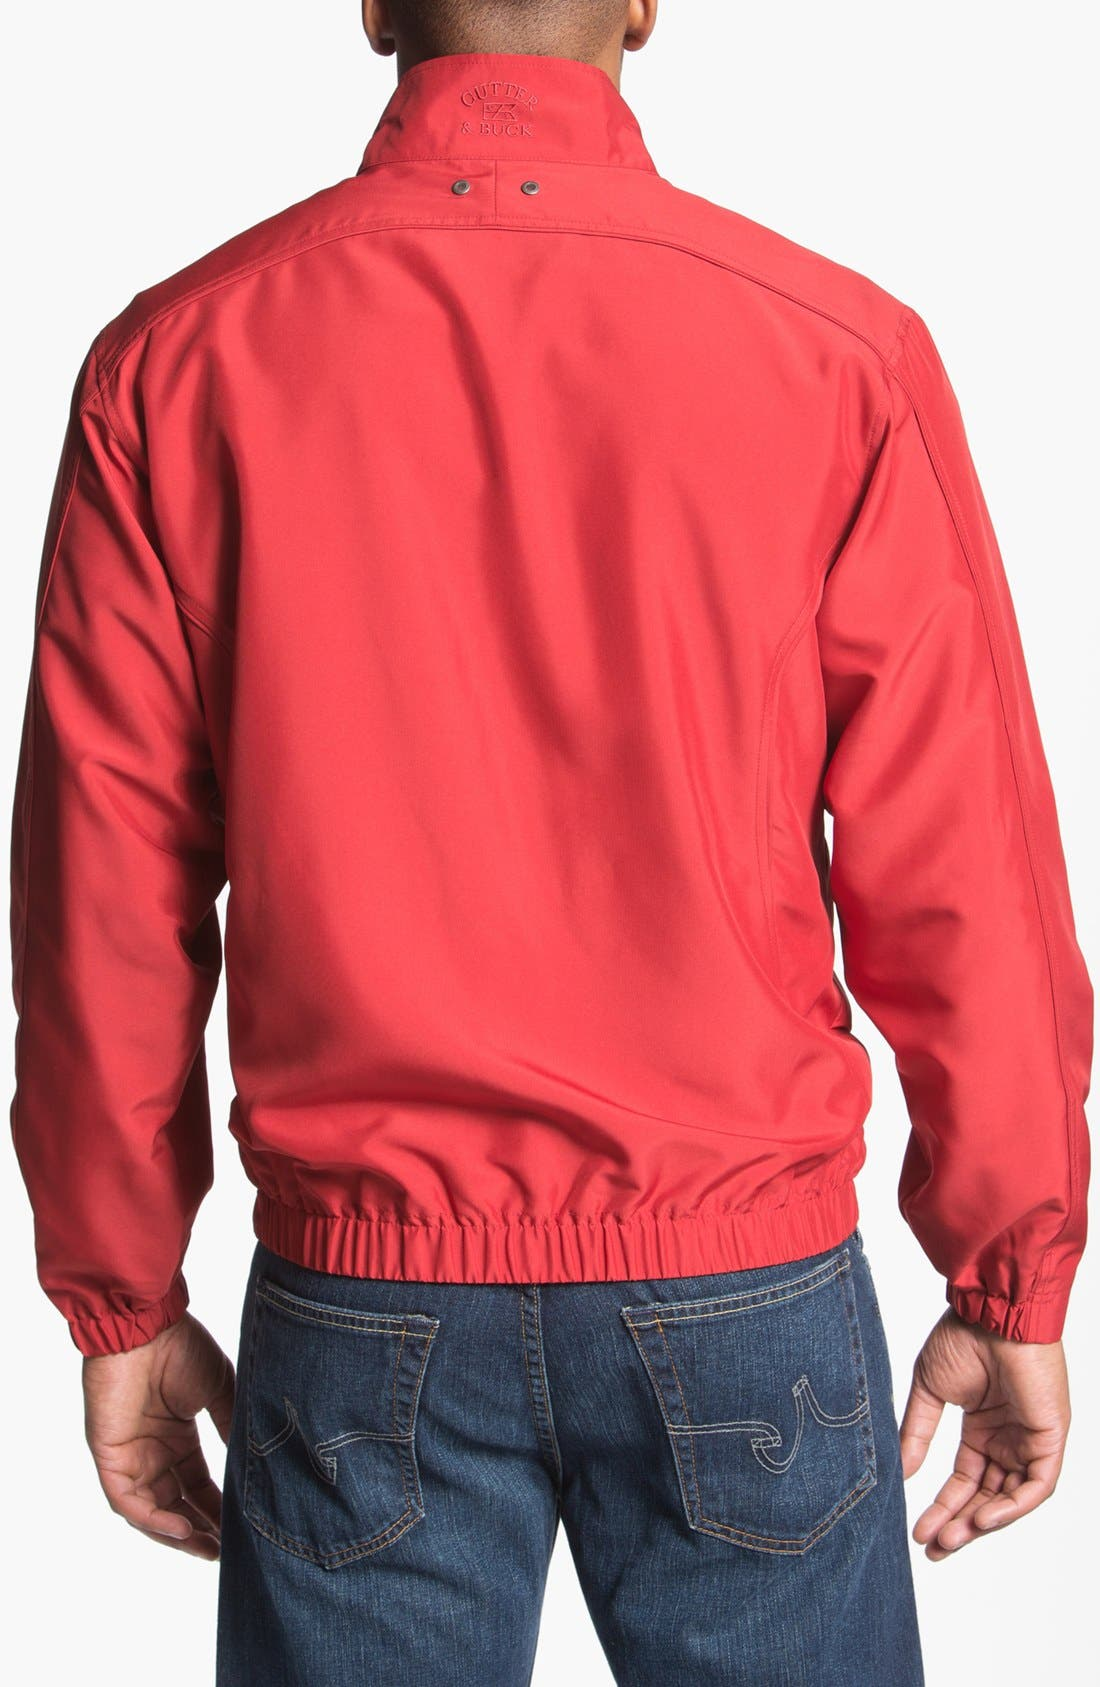 Alternate Image 2  - Cutter & Buck 'Astute' Windbreaker Jacket (Big & Tall)